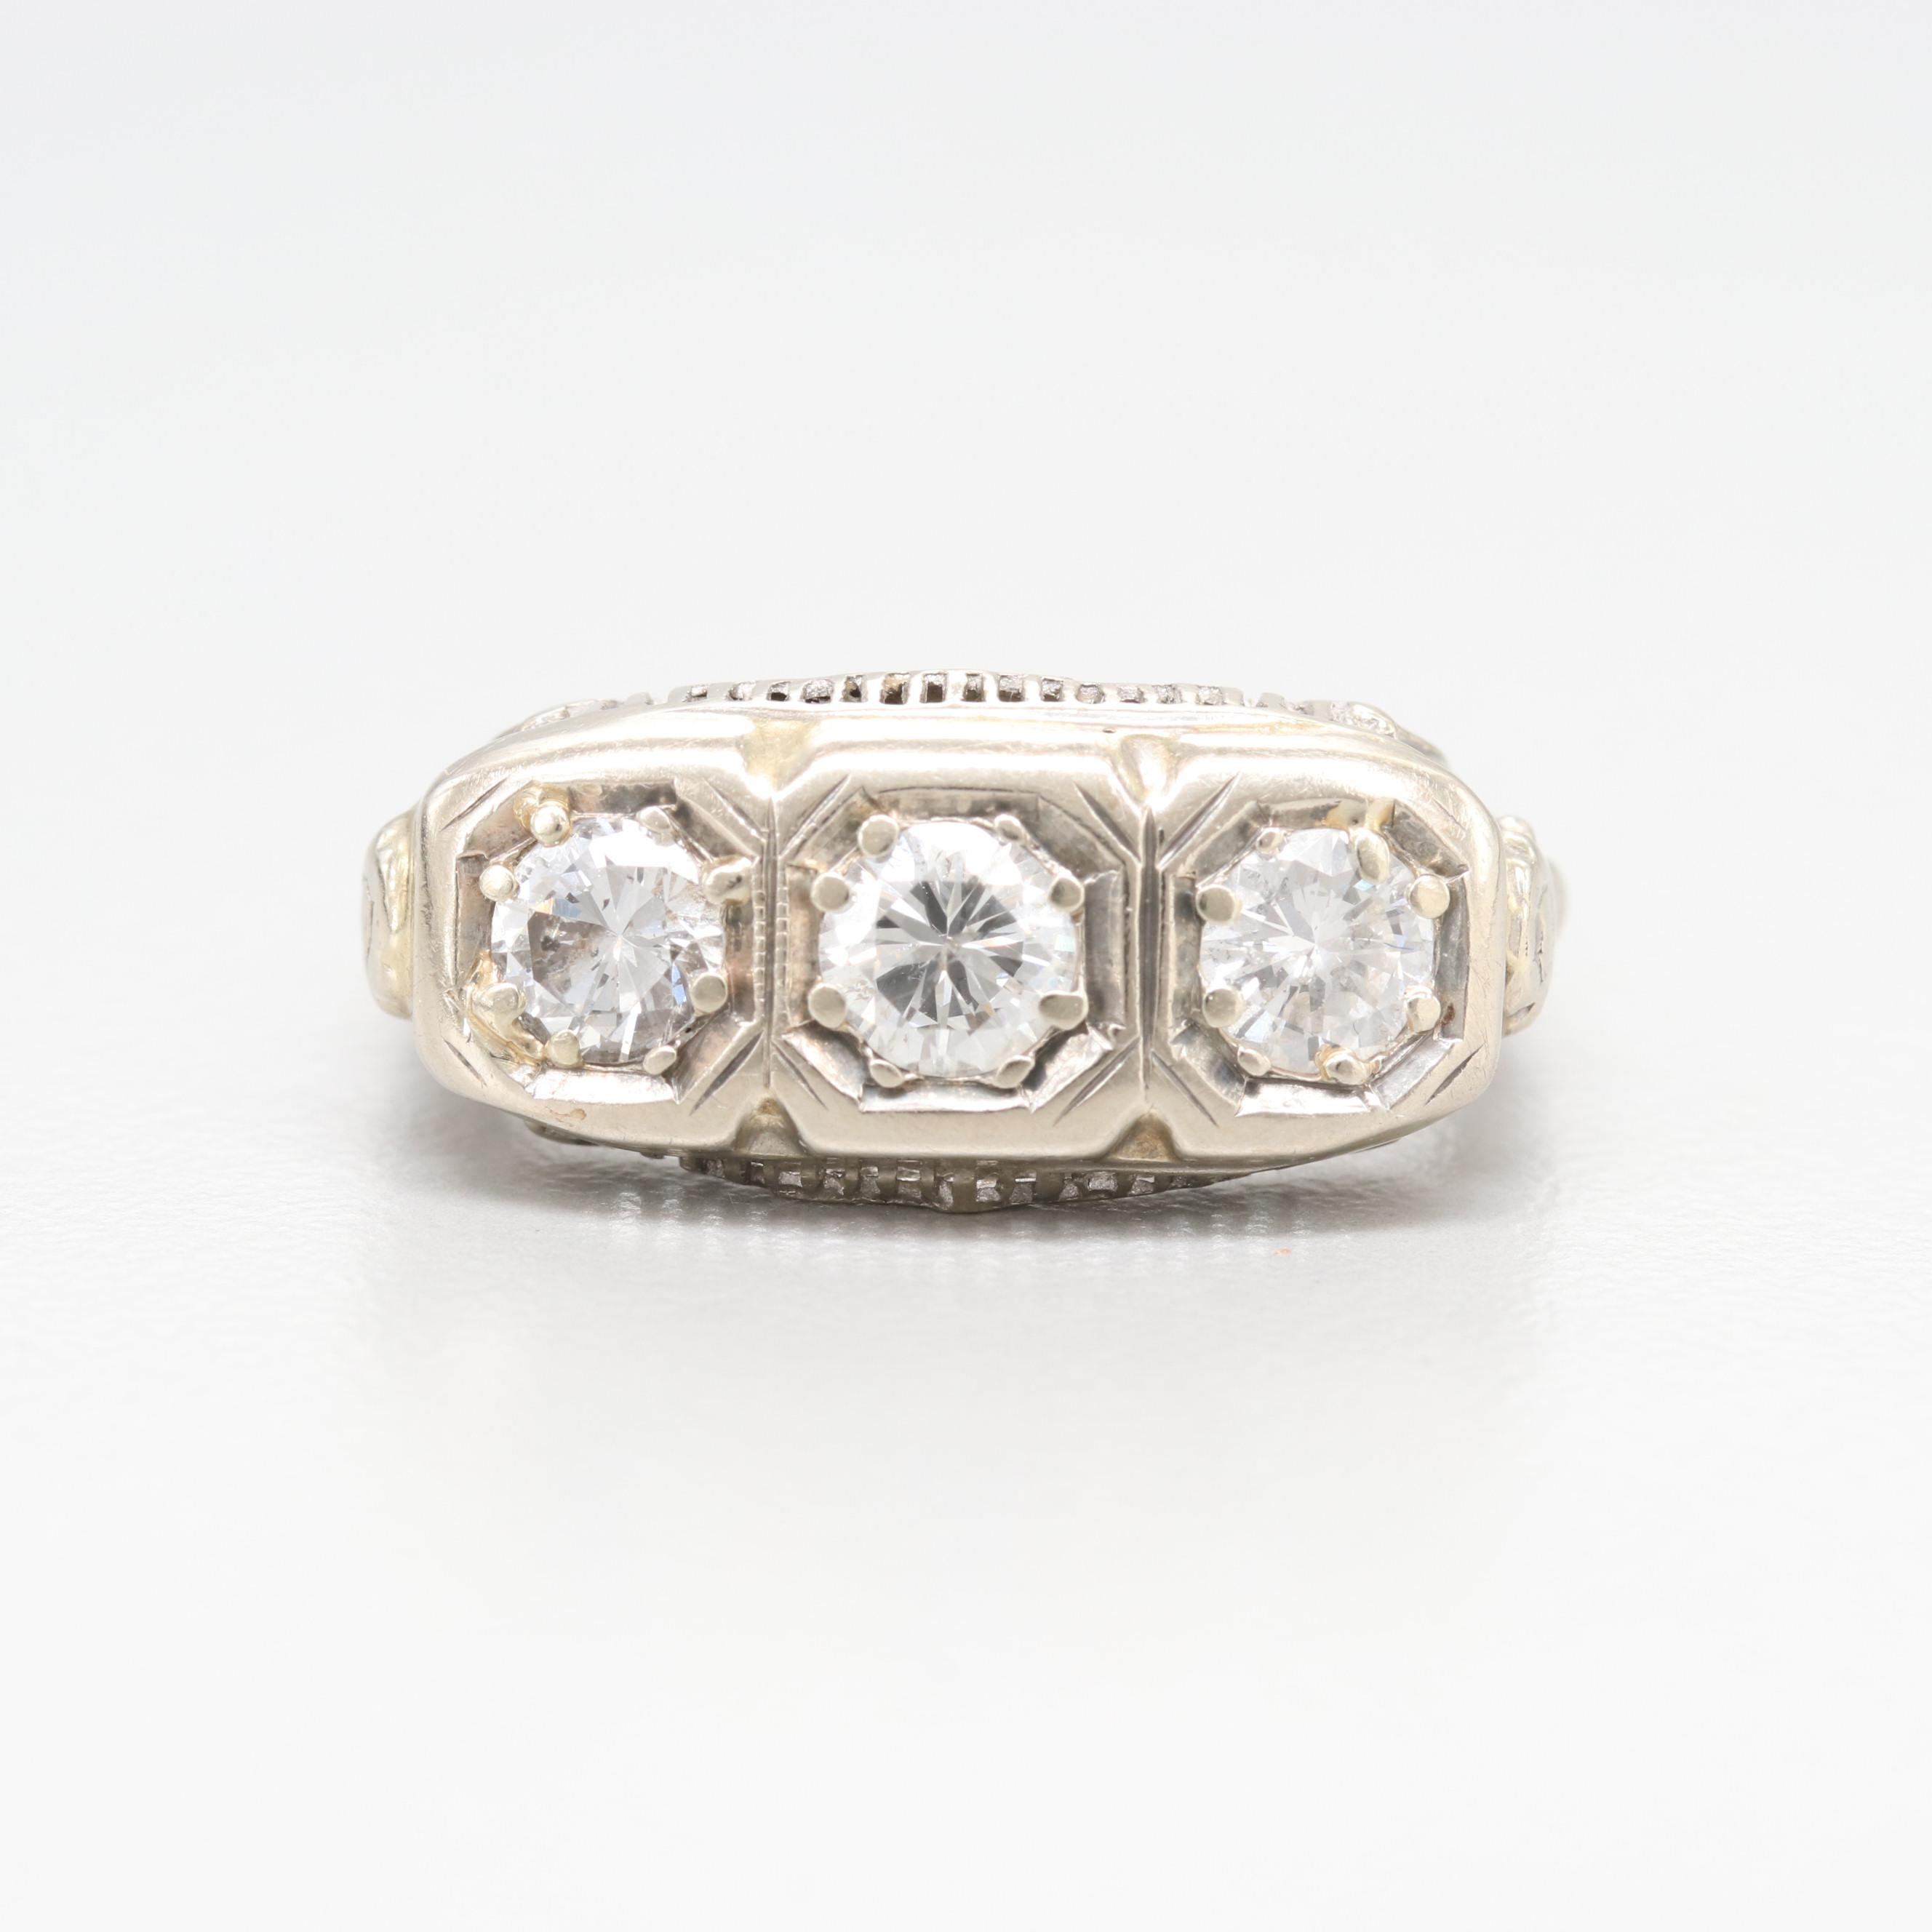 14K White Gold 0.95 CTW Diamond Ring